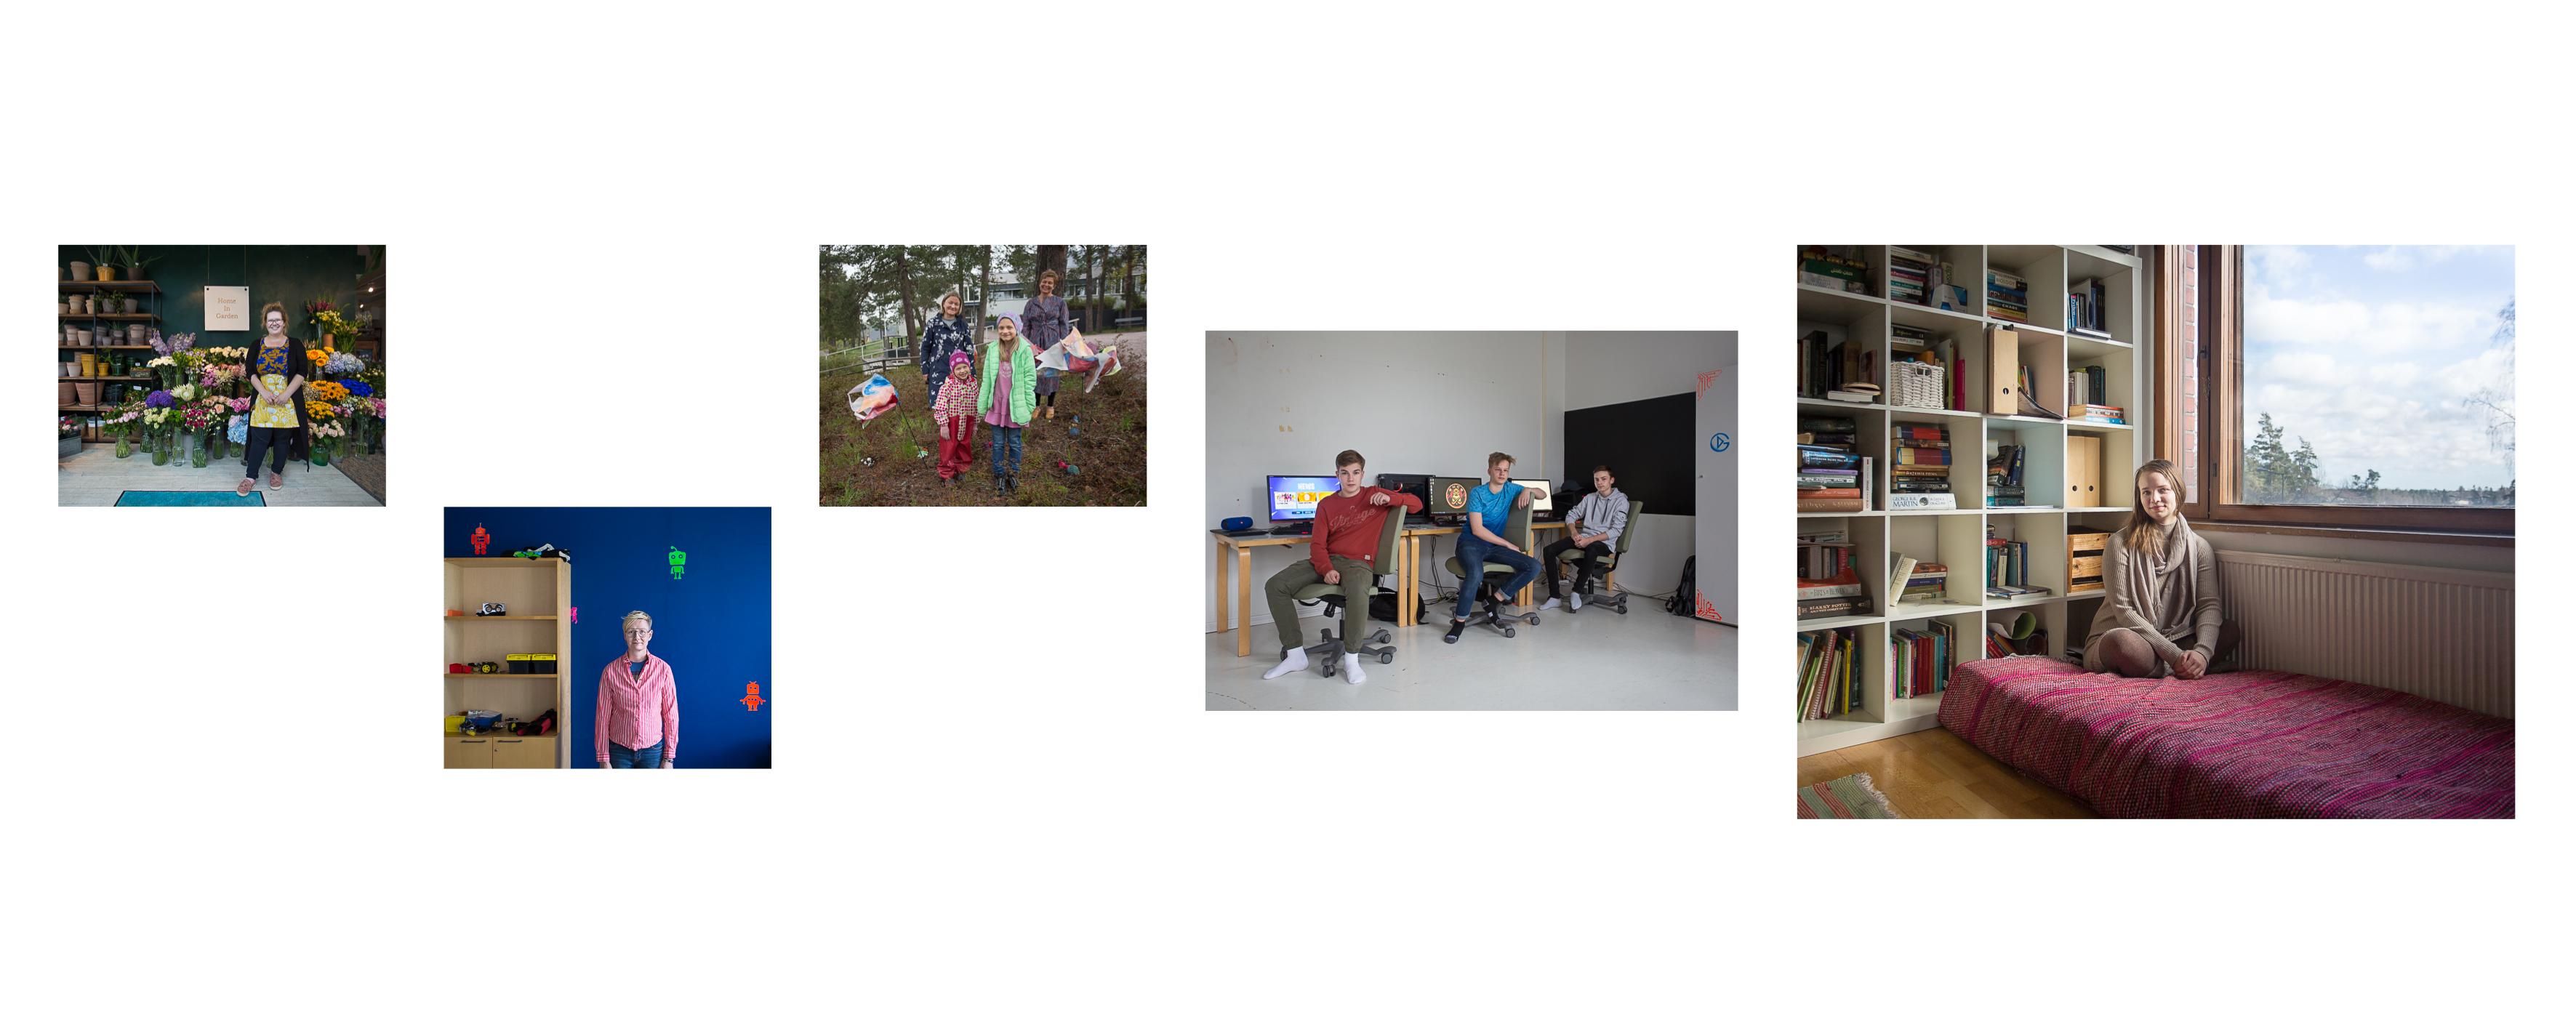 Kaunianen exhibition _ Saga montage 2